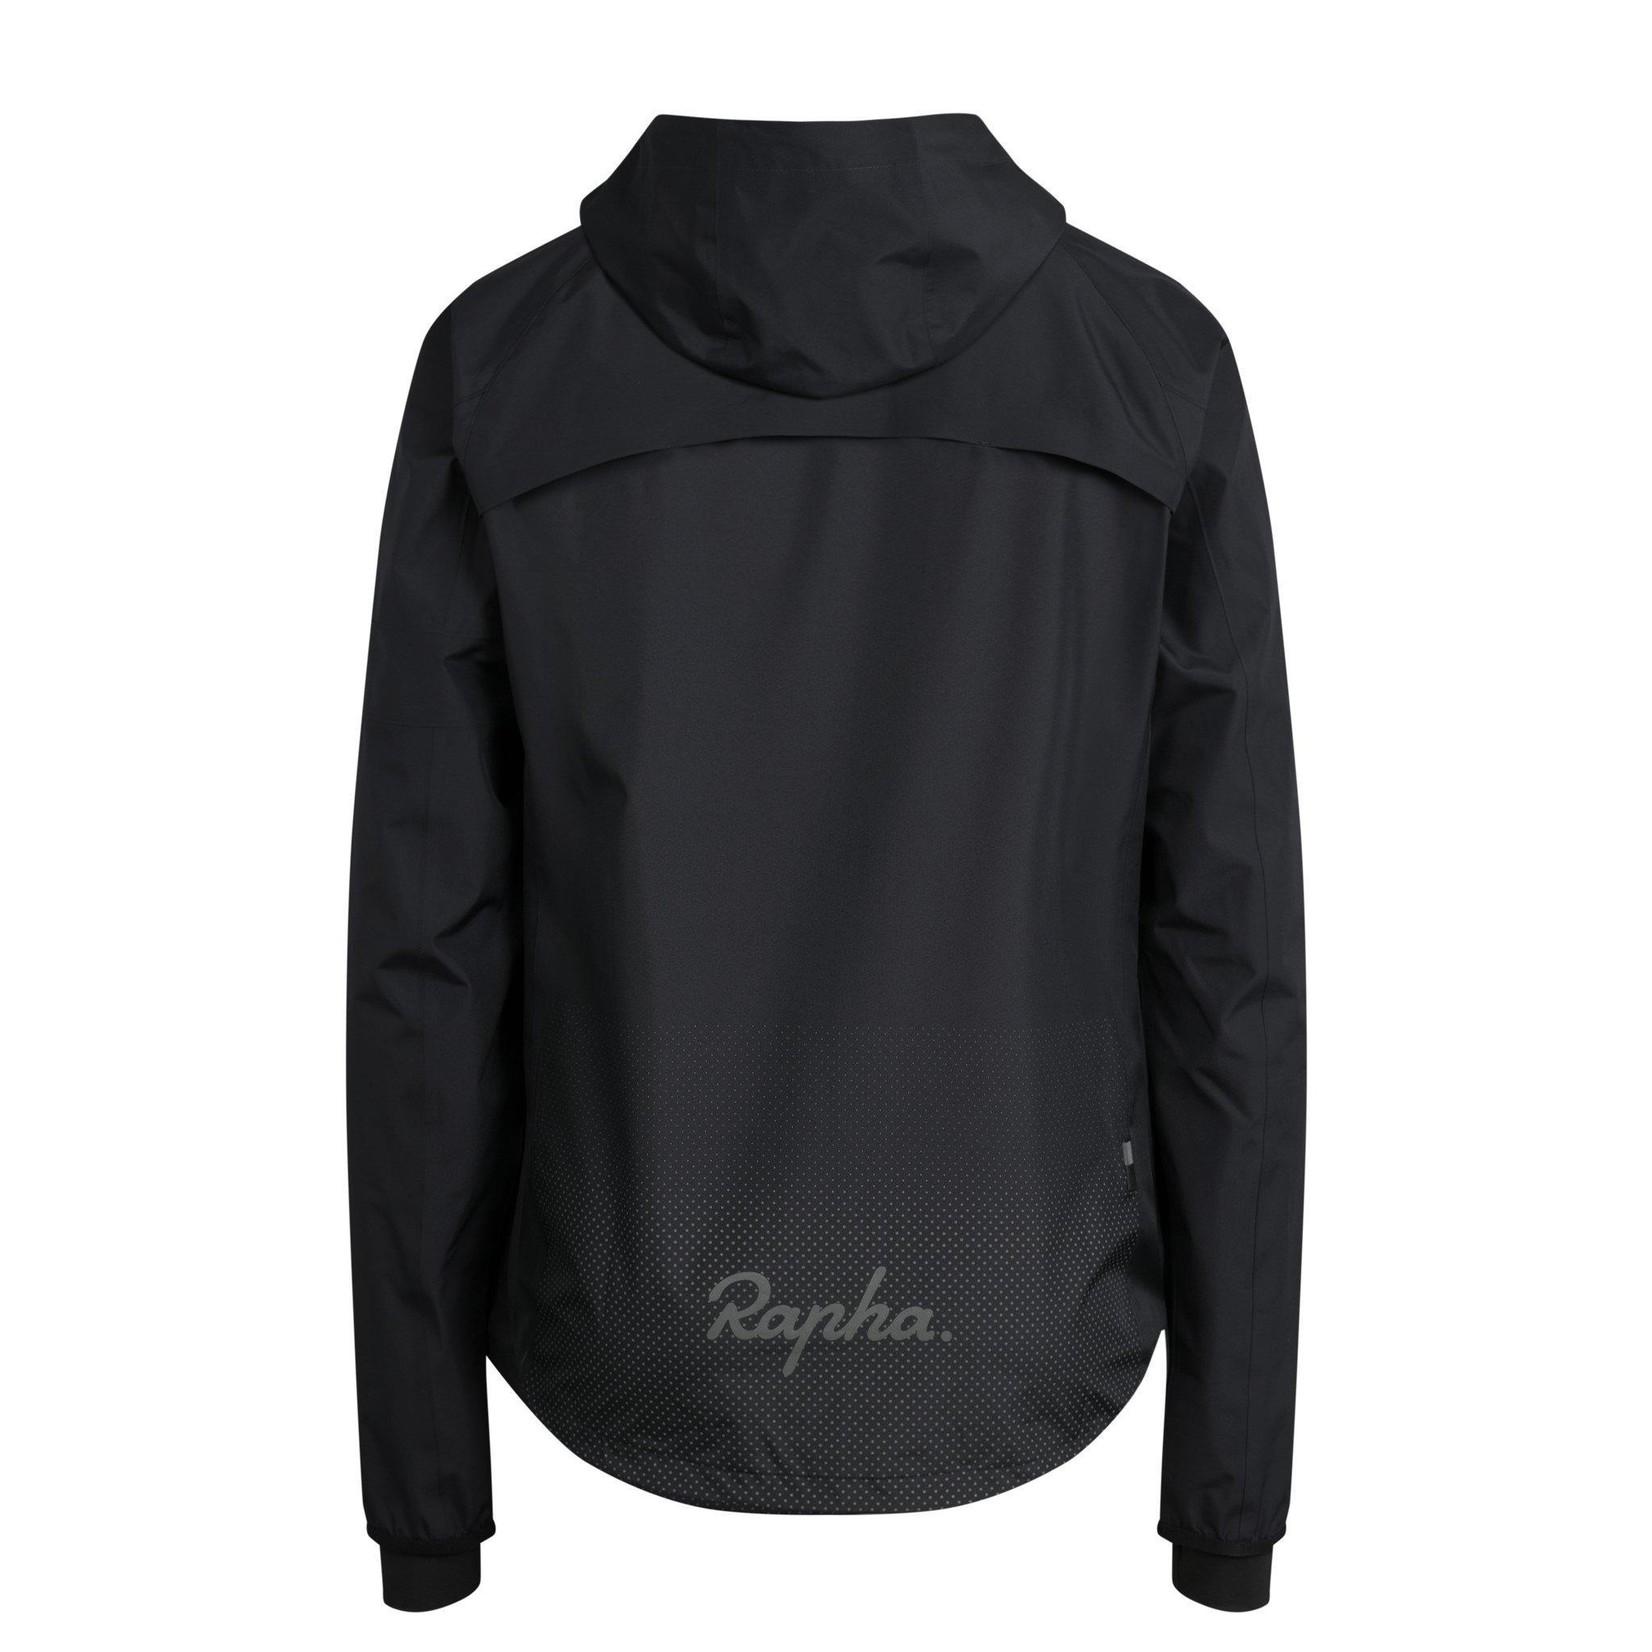 Rapha Rapha Commuter Jacket